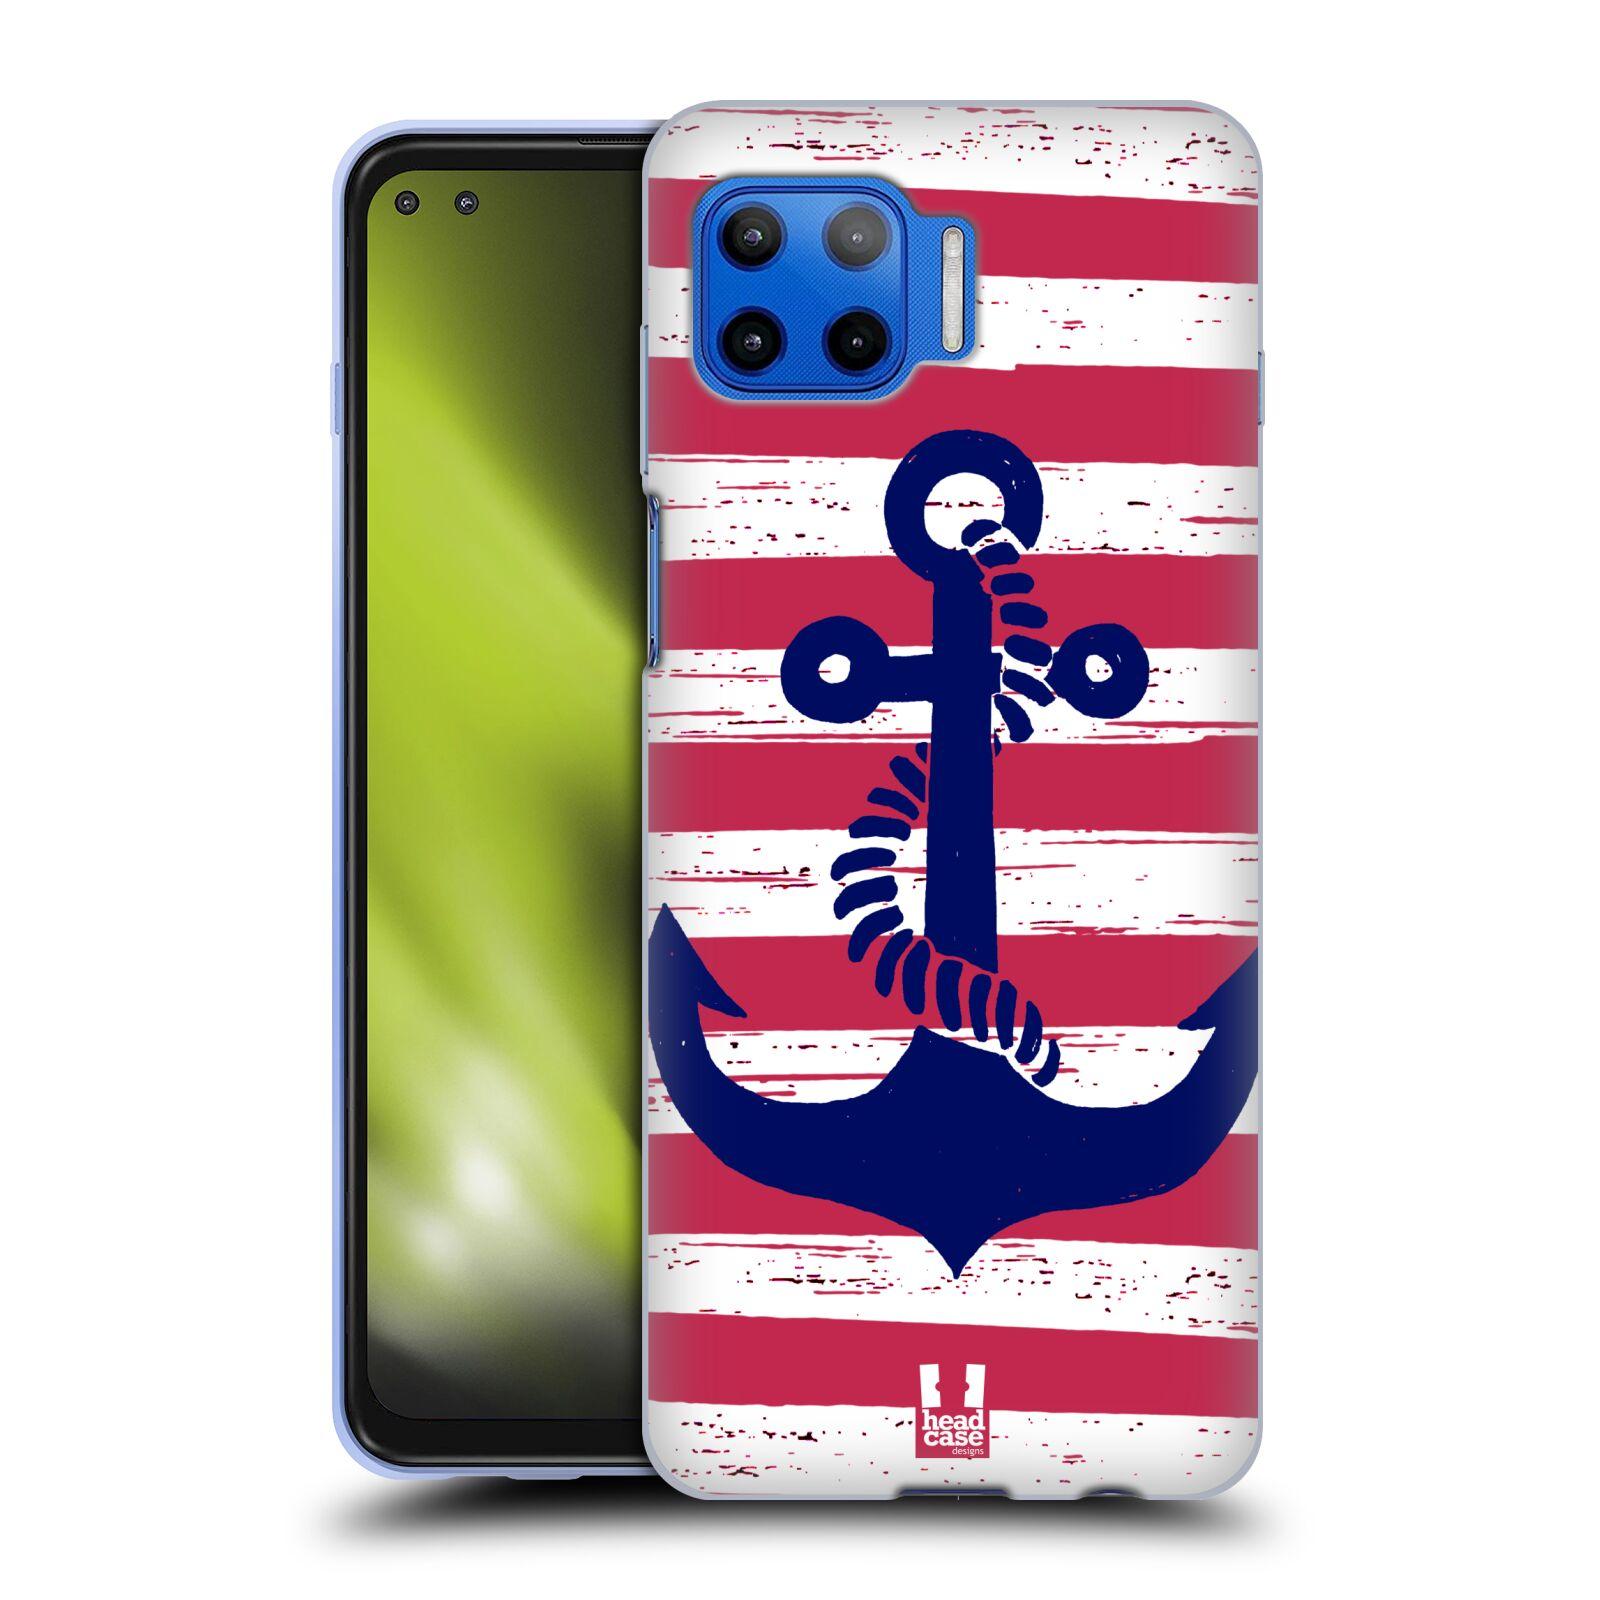 Silikonové pouzdro na mobil Motorola Moto G 5G Plus - Head Case - KOTVA S PRUHY